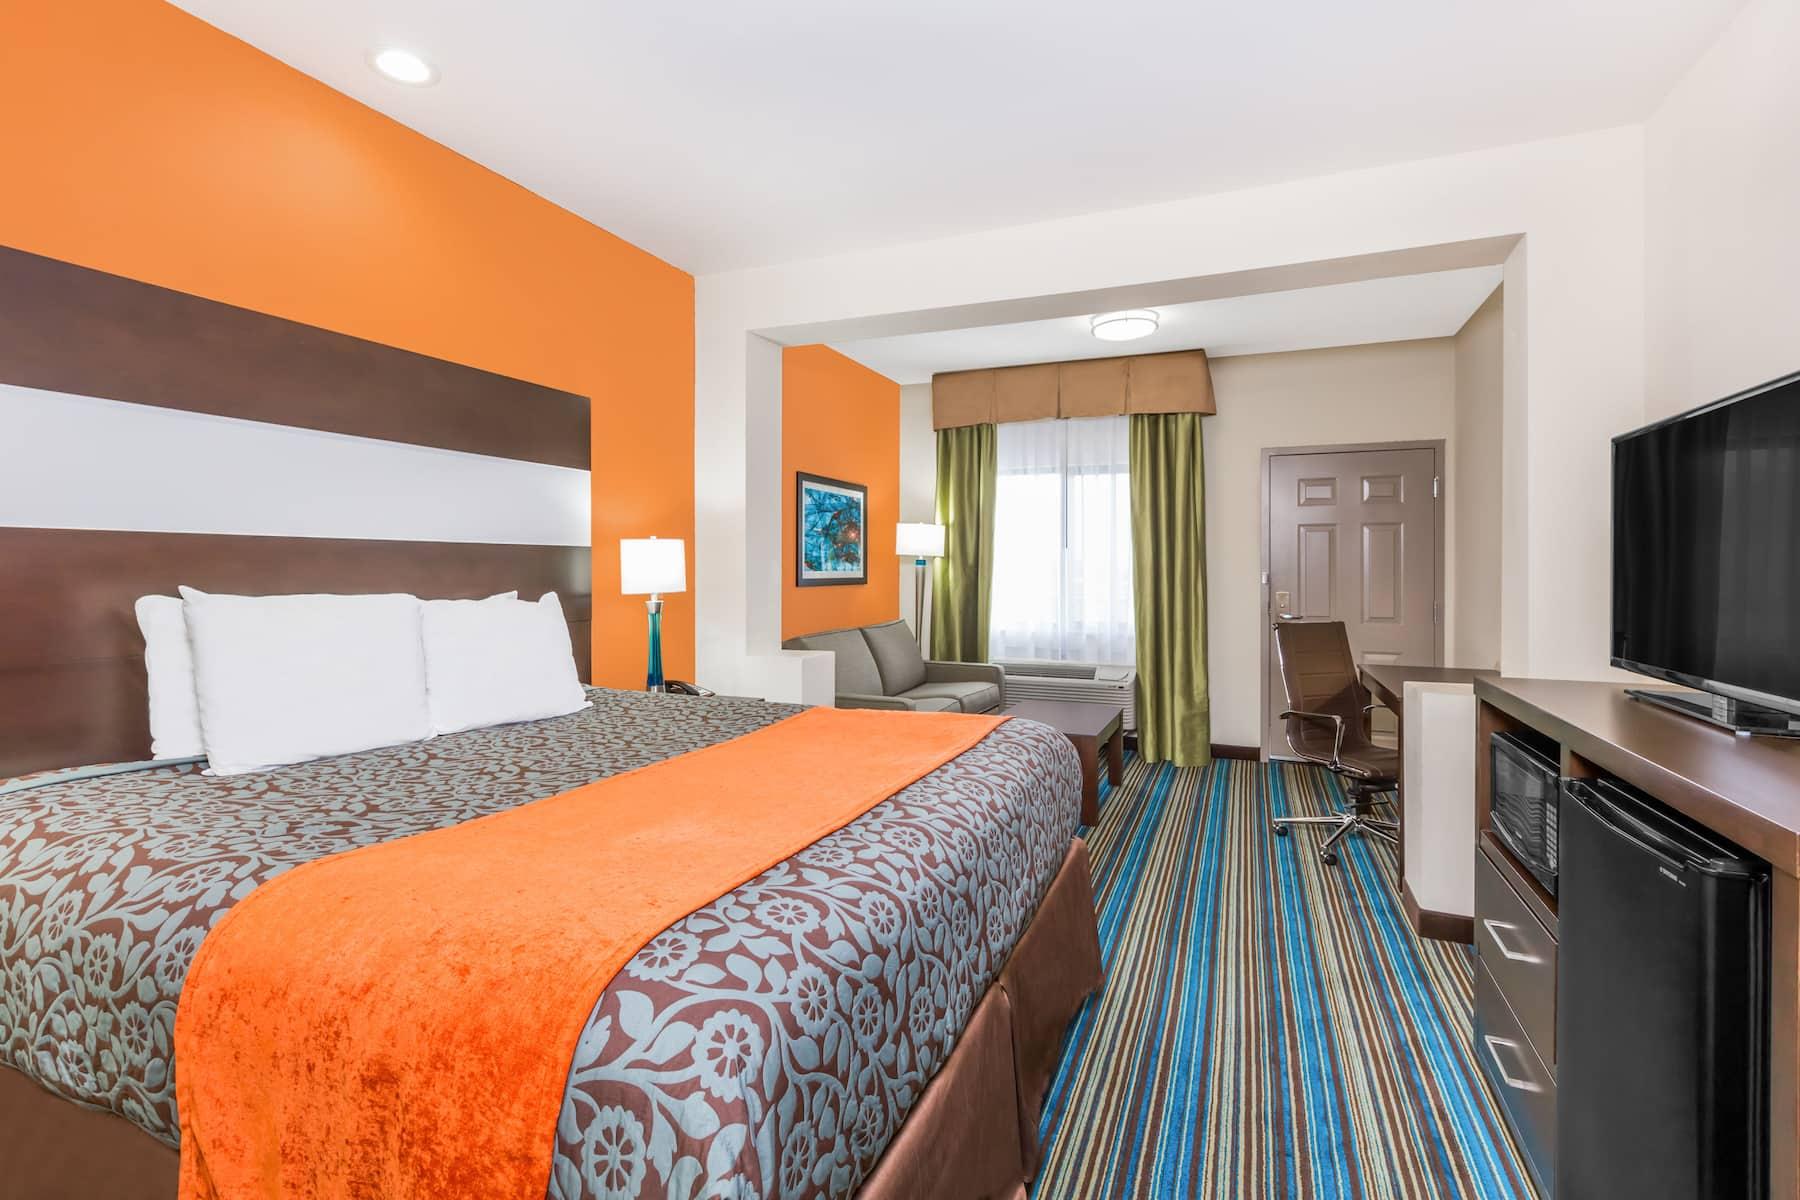 Days Inn Amp Suites By Wyndham Katy Katy Tx Hotels